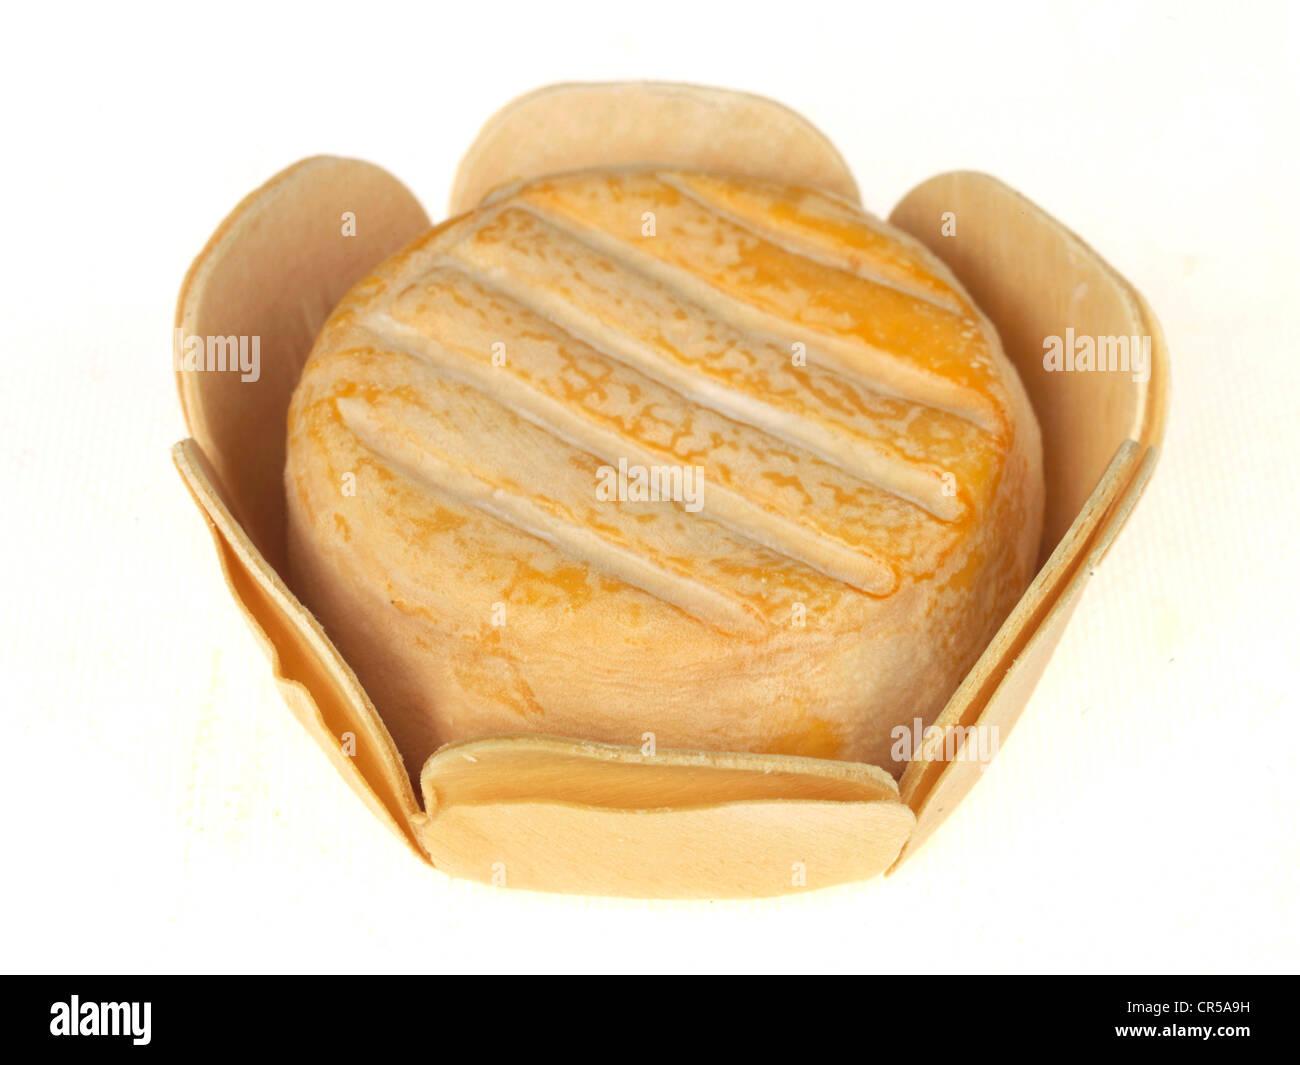 Saint Vernier Cheese - Stock Image